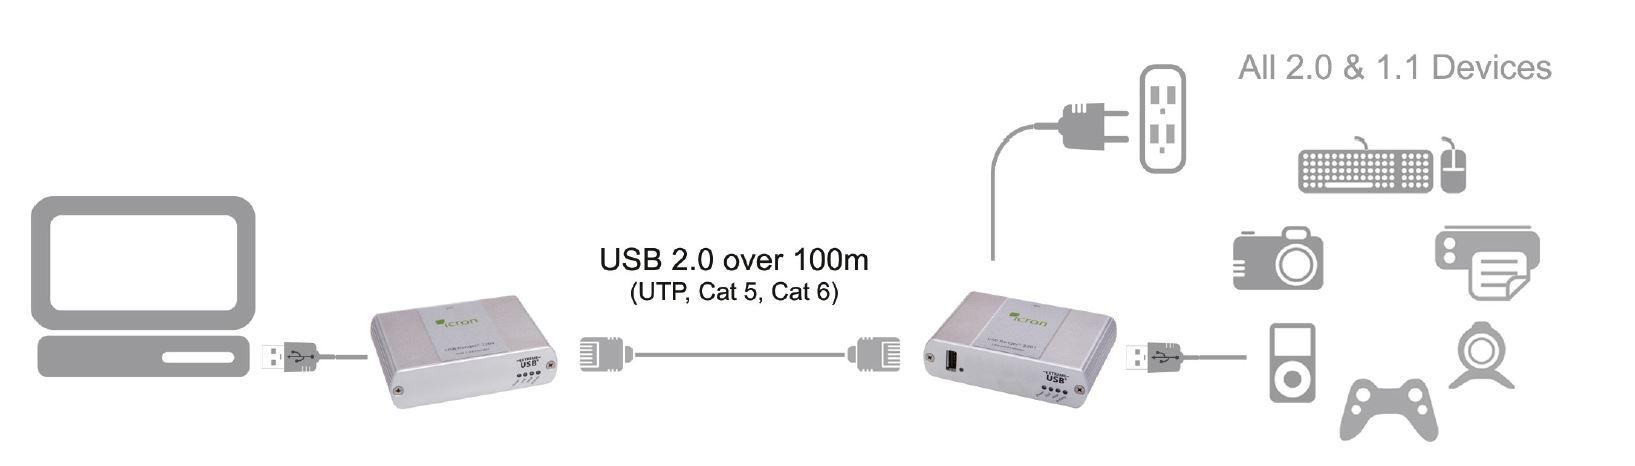 00-00298-icron-usb-2-0-ranger-2201-usb-extender-cat-5e-100m-diagramm